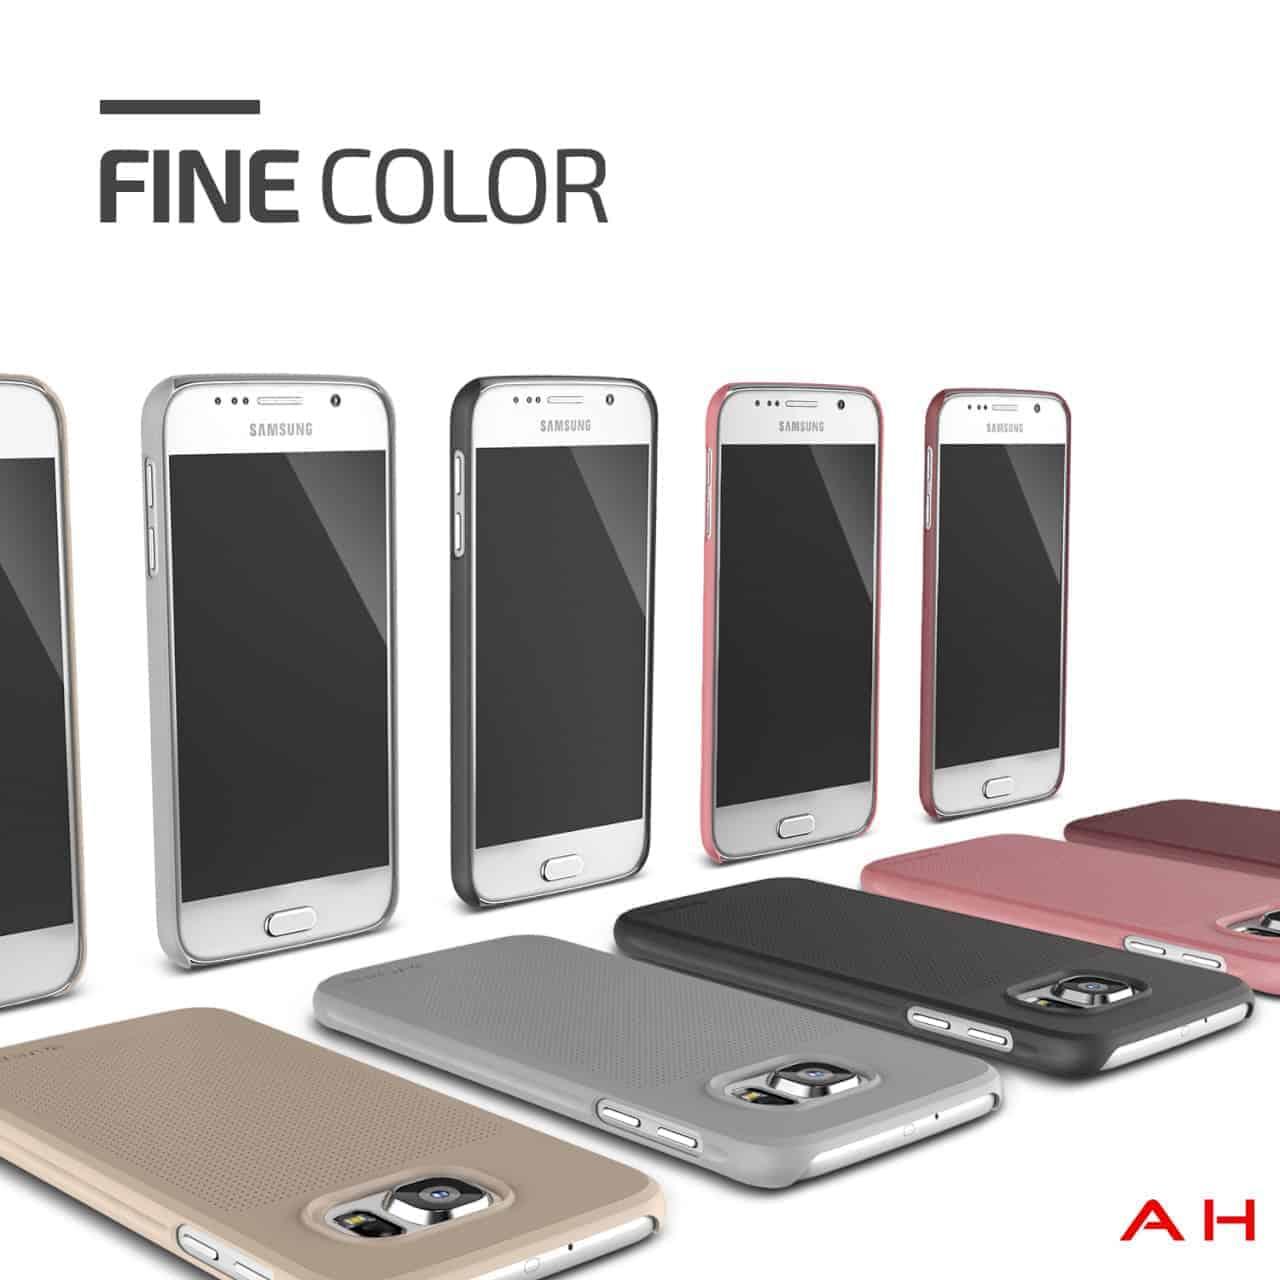 AH Samsung Galaxy S6 Verus Leaked Images 5